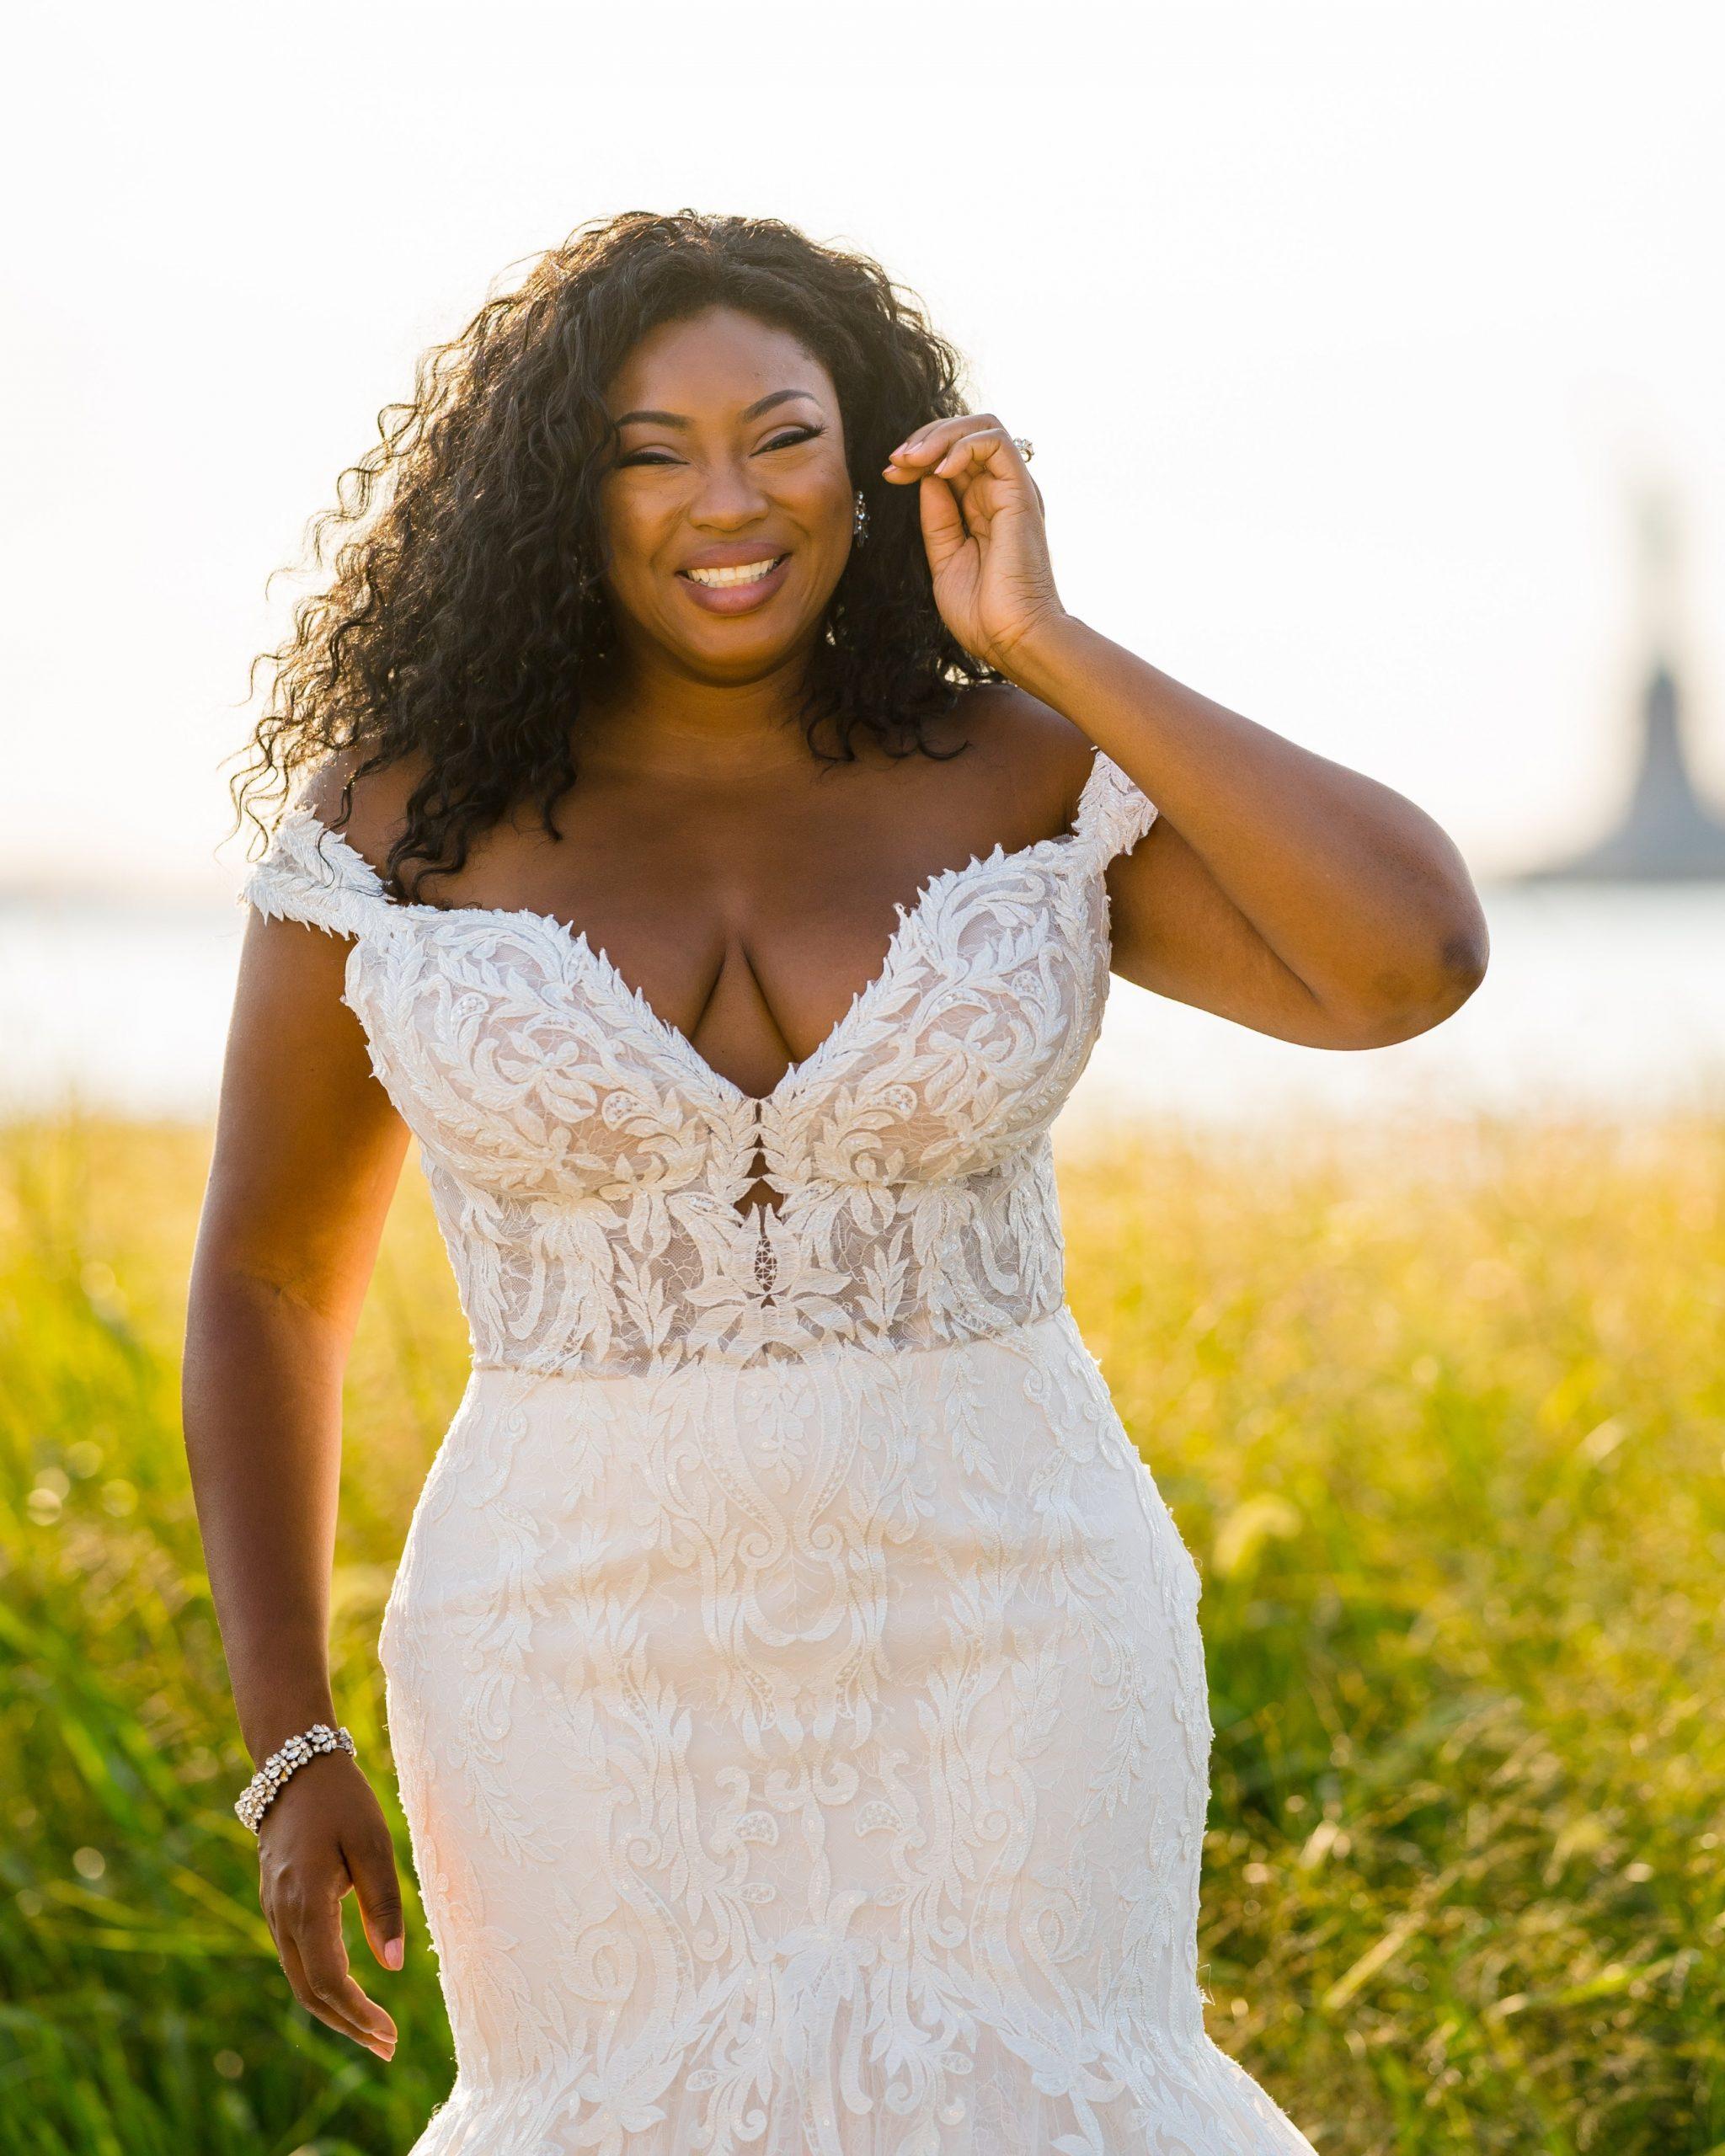 Black Plus Size Model Wearing Mermaid Wedding Dress Called Joss by Sottero and Midgley